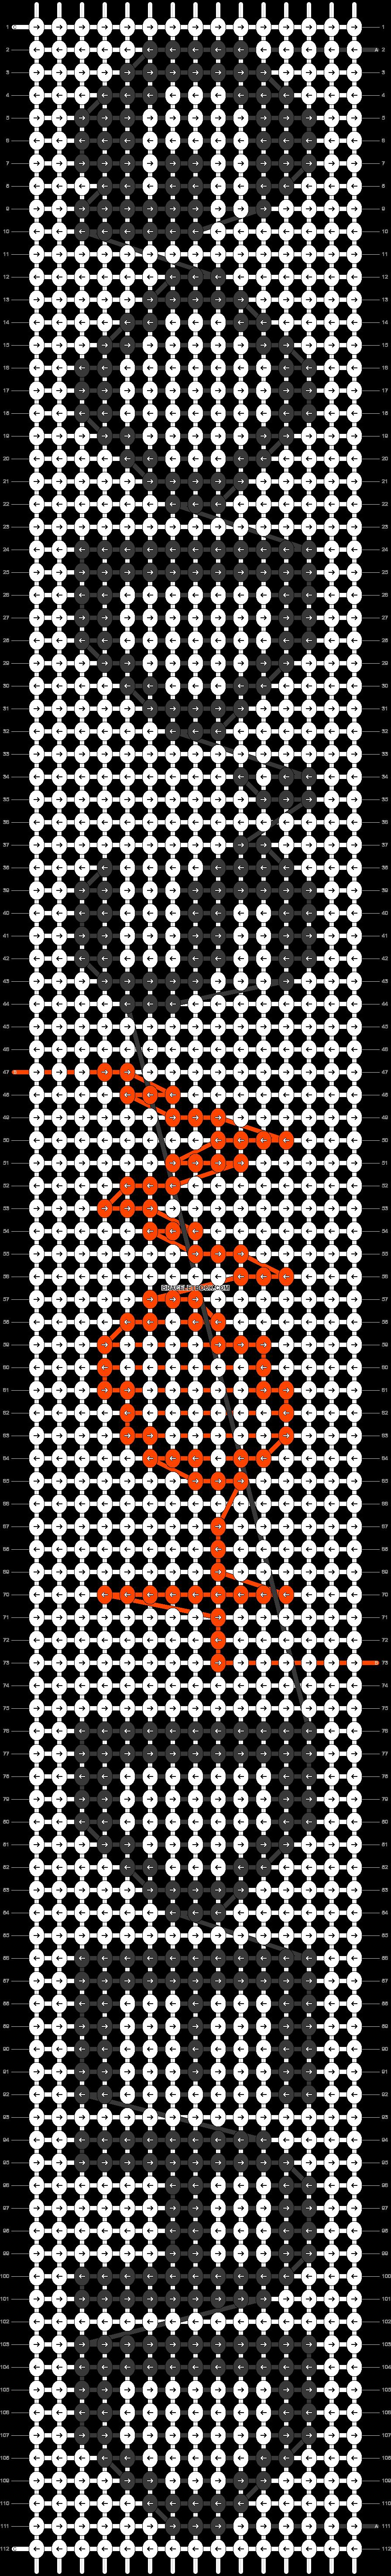 Alpha pattern #51821 pattern